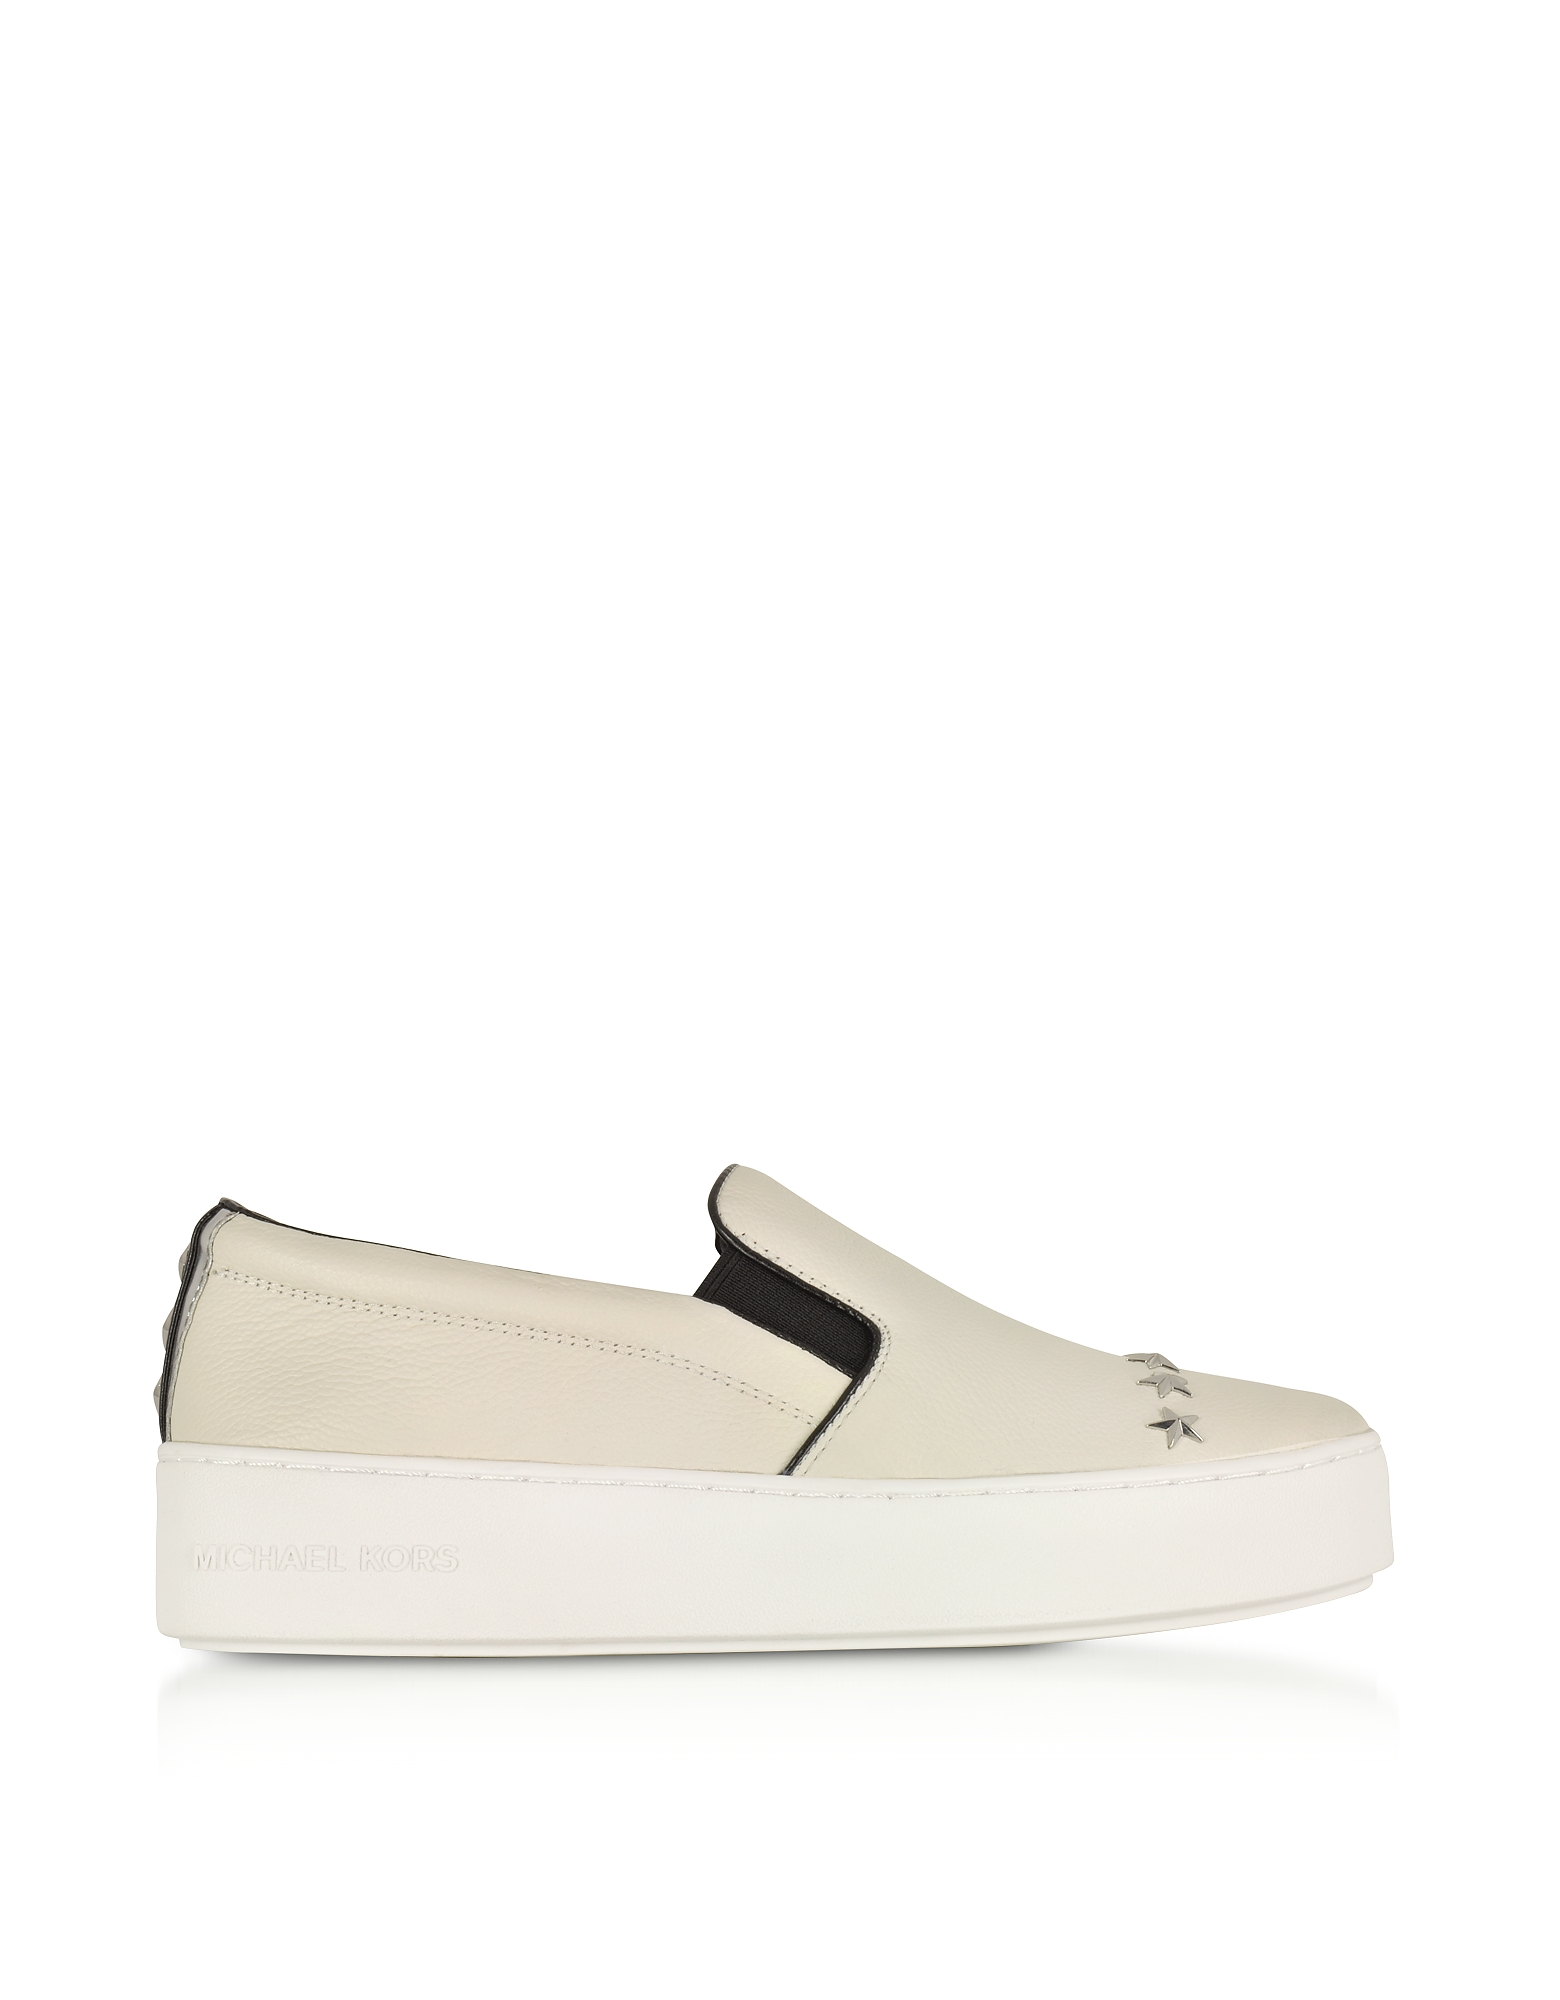 Michael Kors Trent Optic White Leather Embellished Slip On Sneakers w/Silvertone Stars